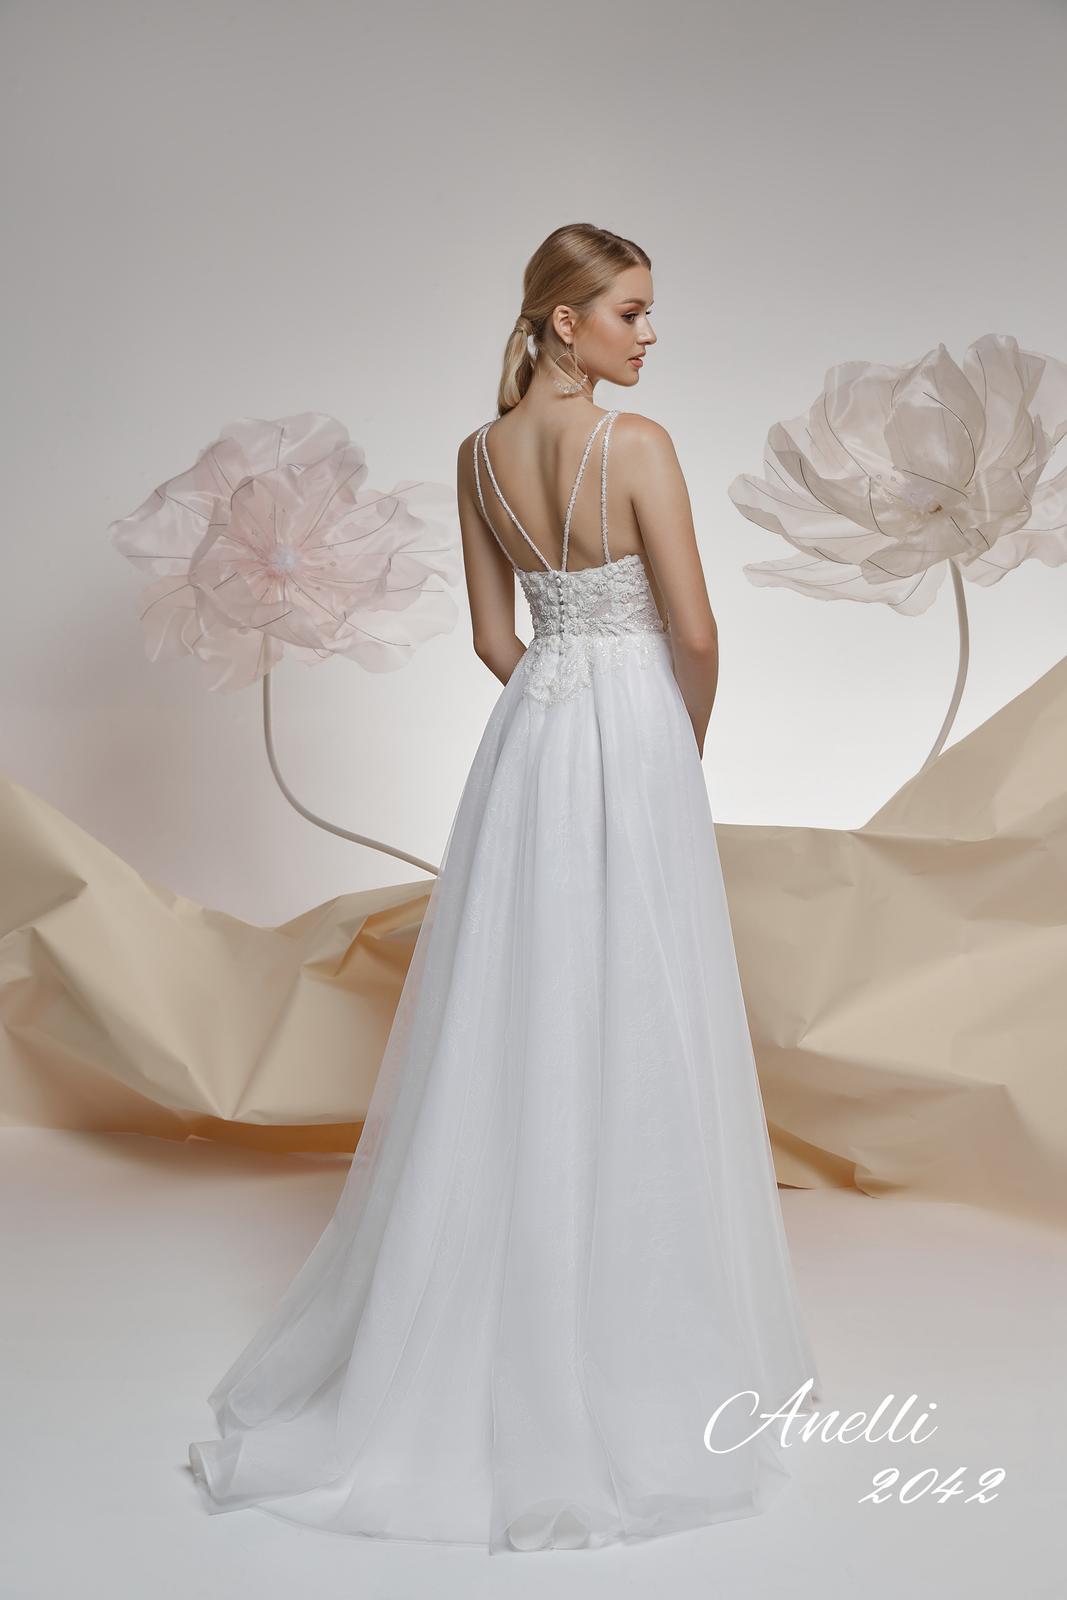 Svadobné šaty - Imagine 2042 - Obrázok č. 3